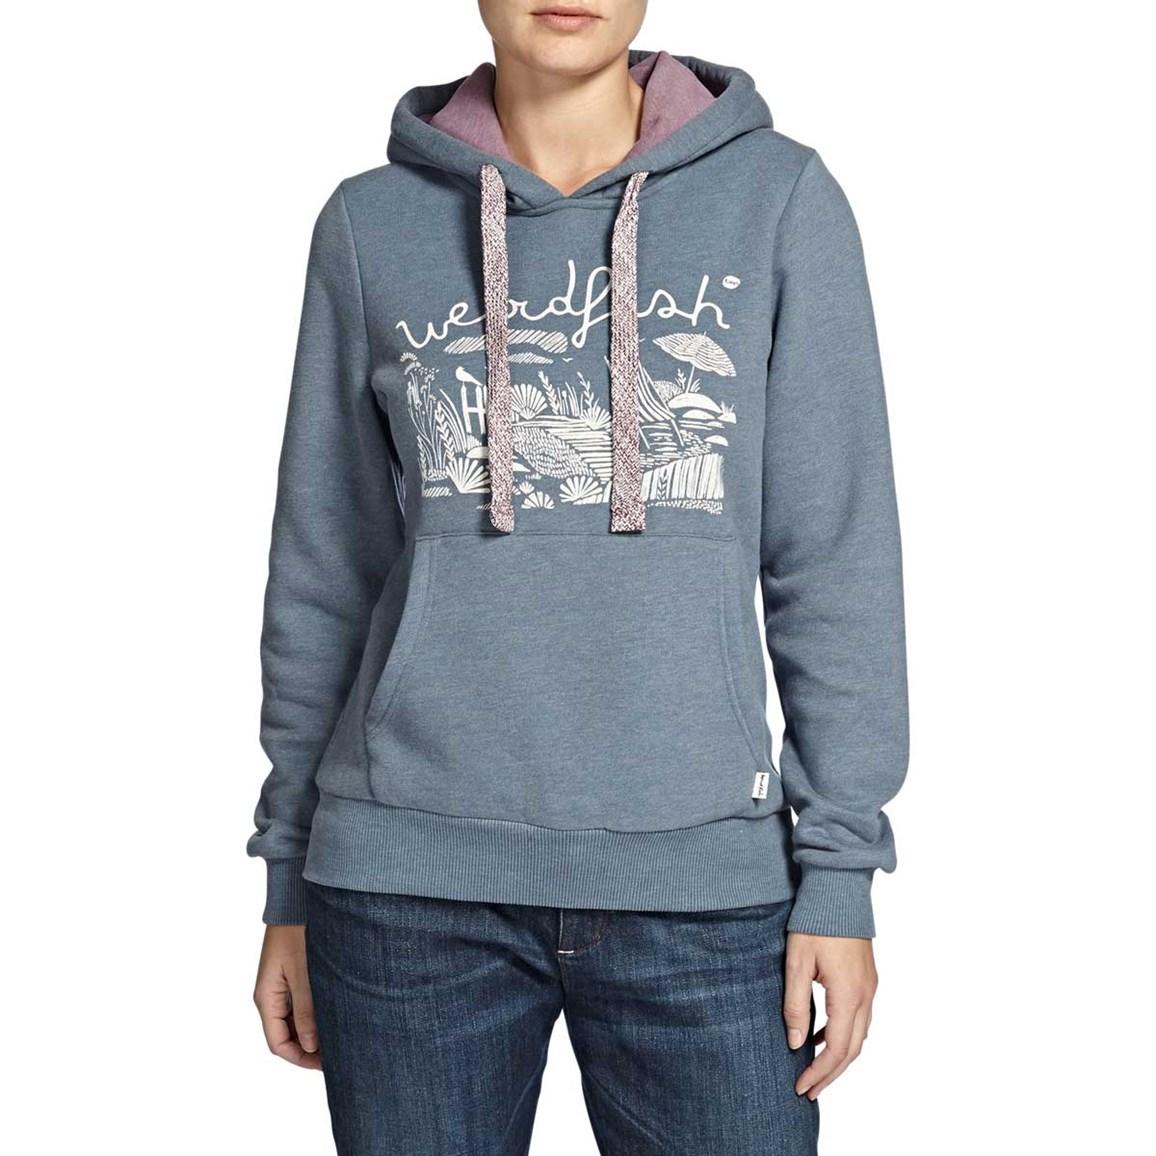 Ophelia Branded Graphic Print Hooded Sweatshirt Storm